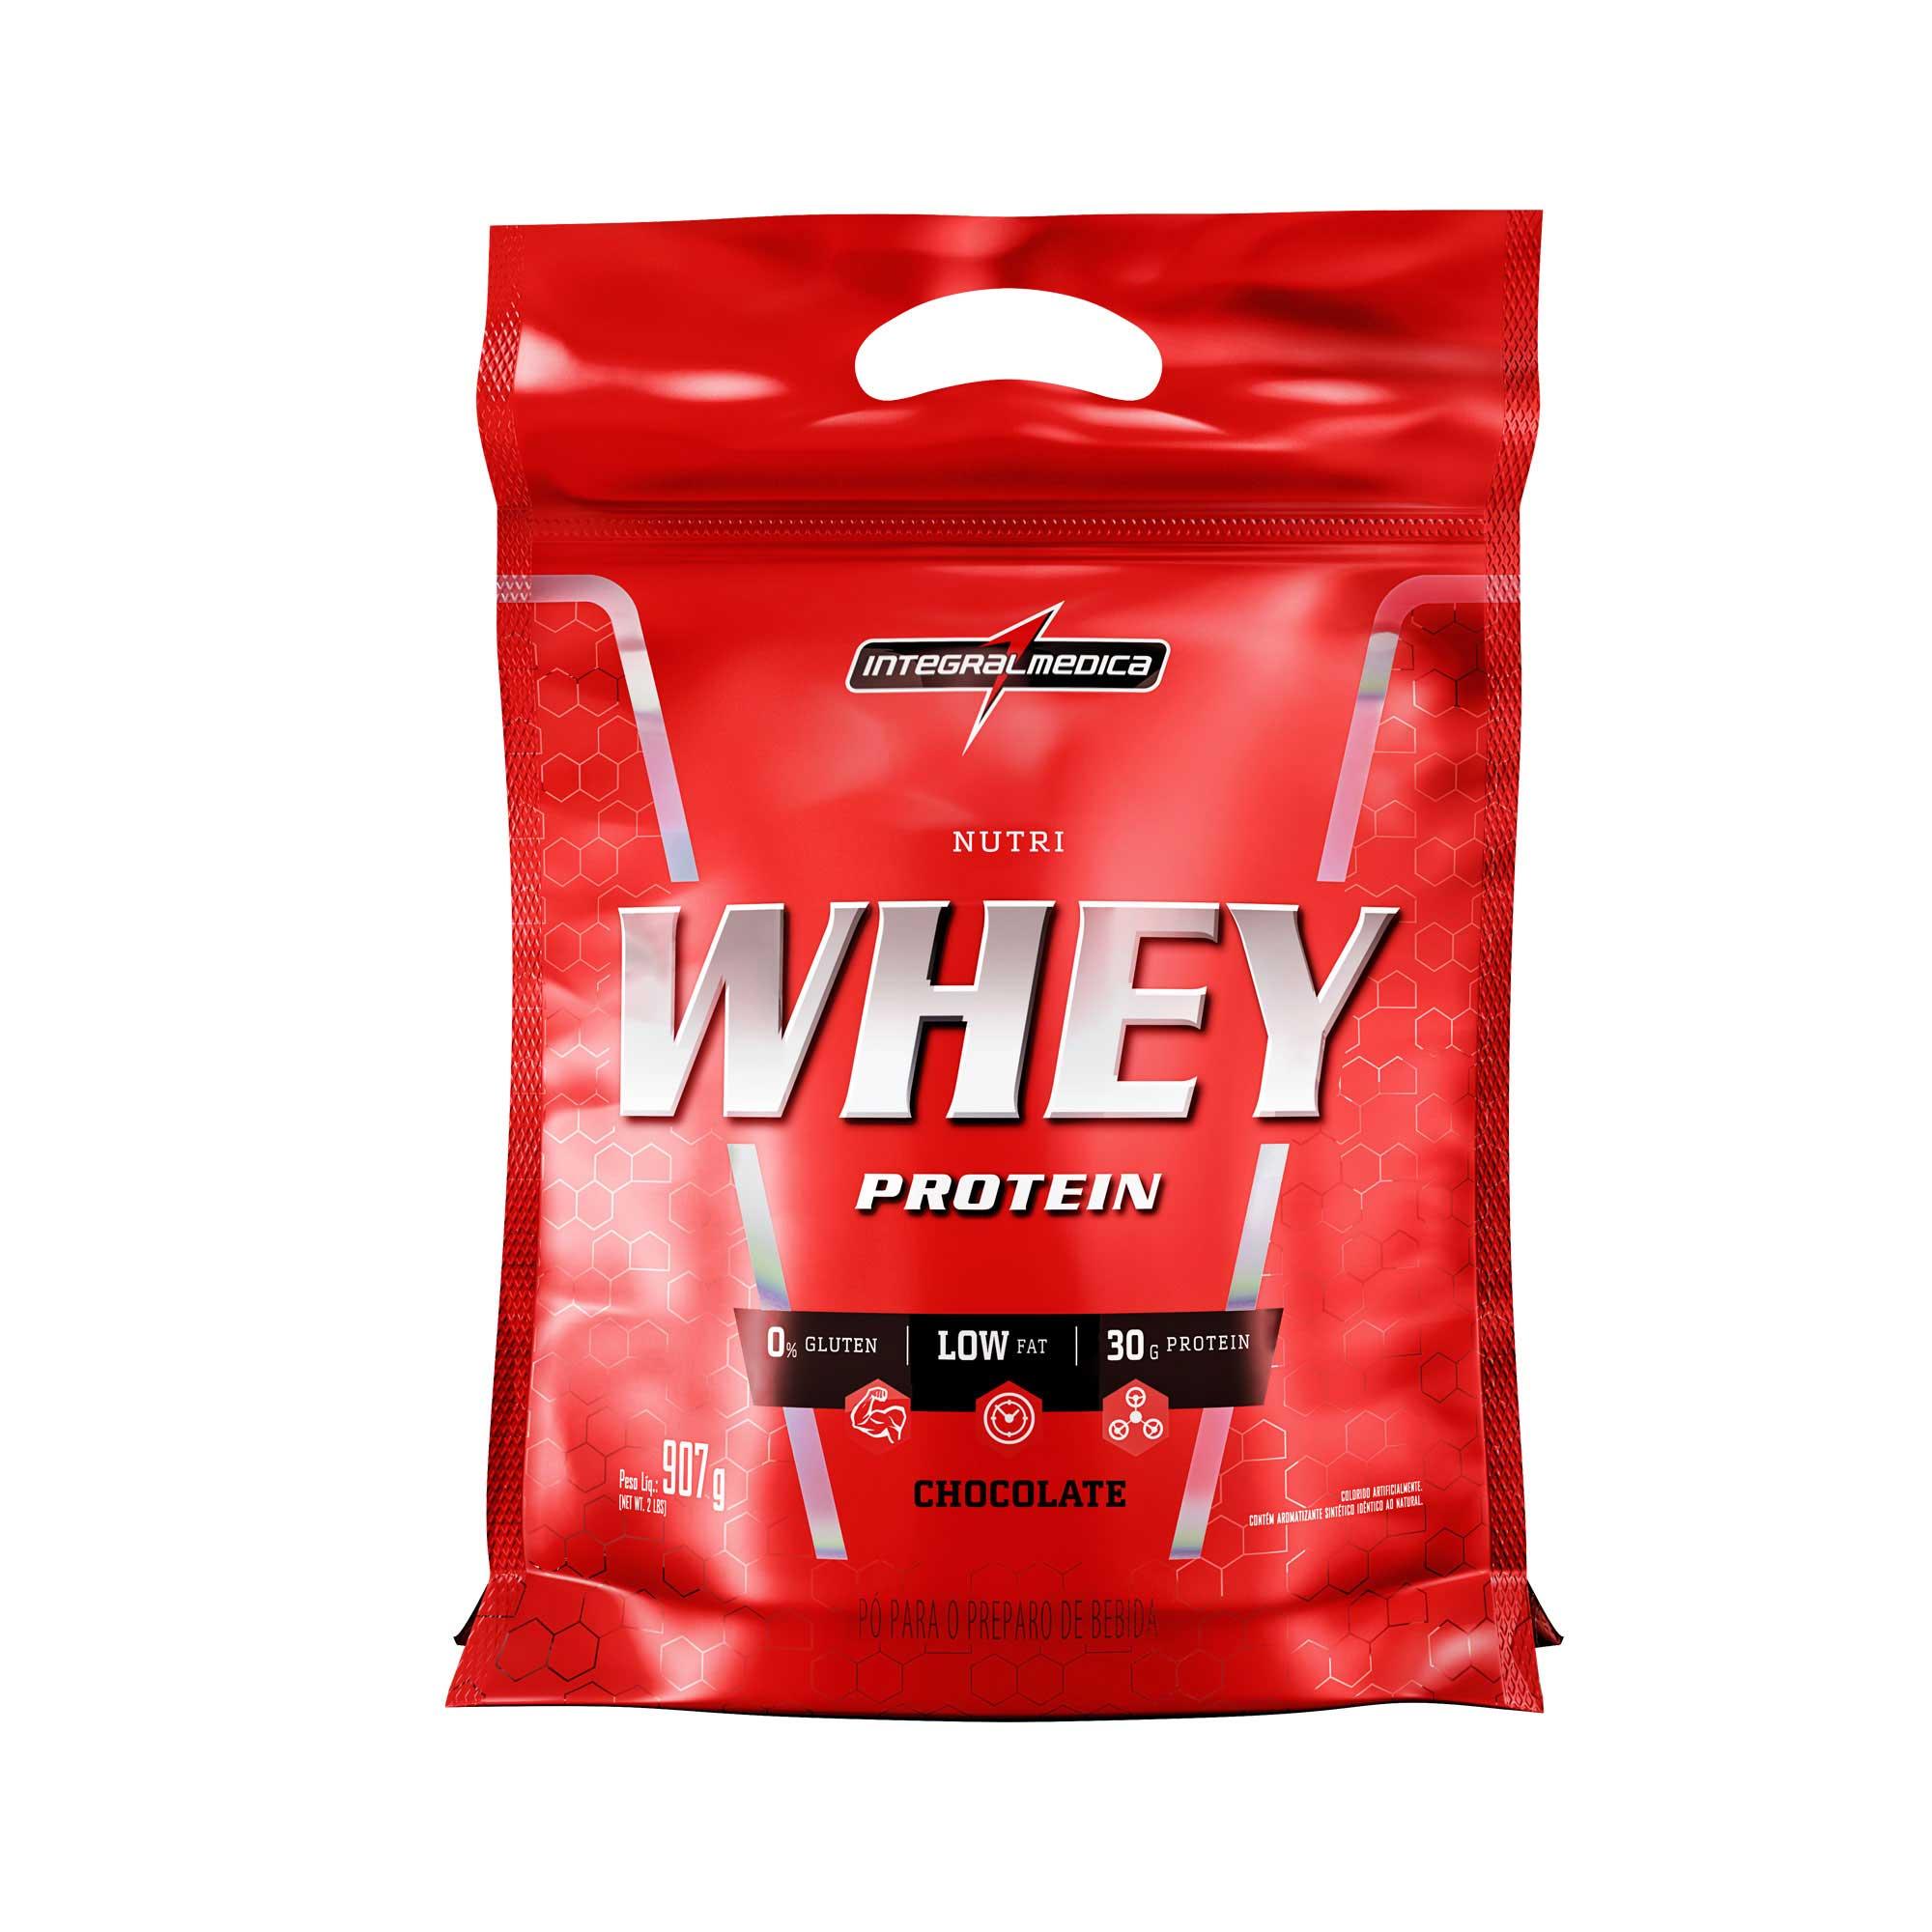 NutriWhey Protein Chocolate 907g Integralmedica